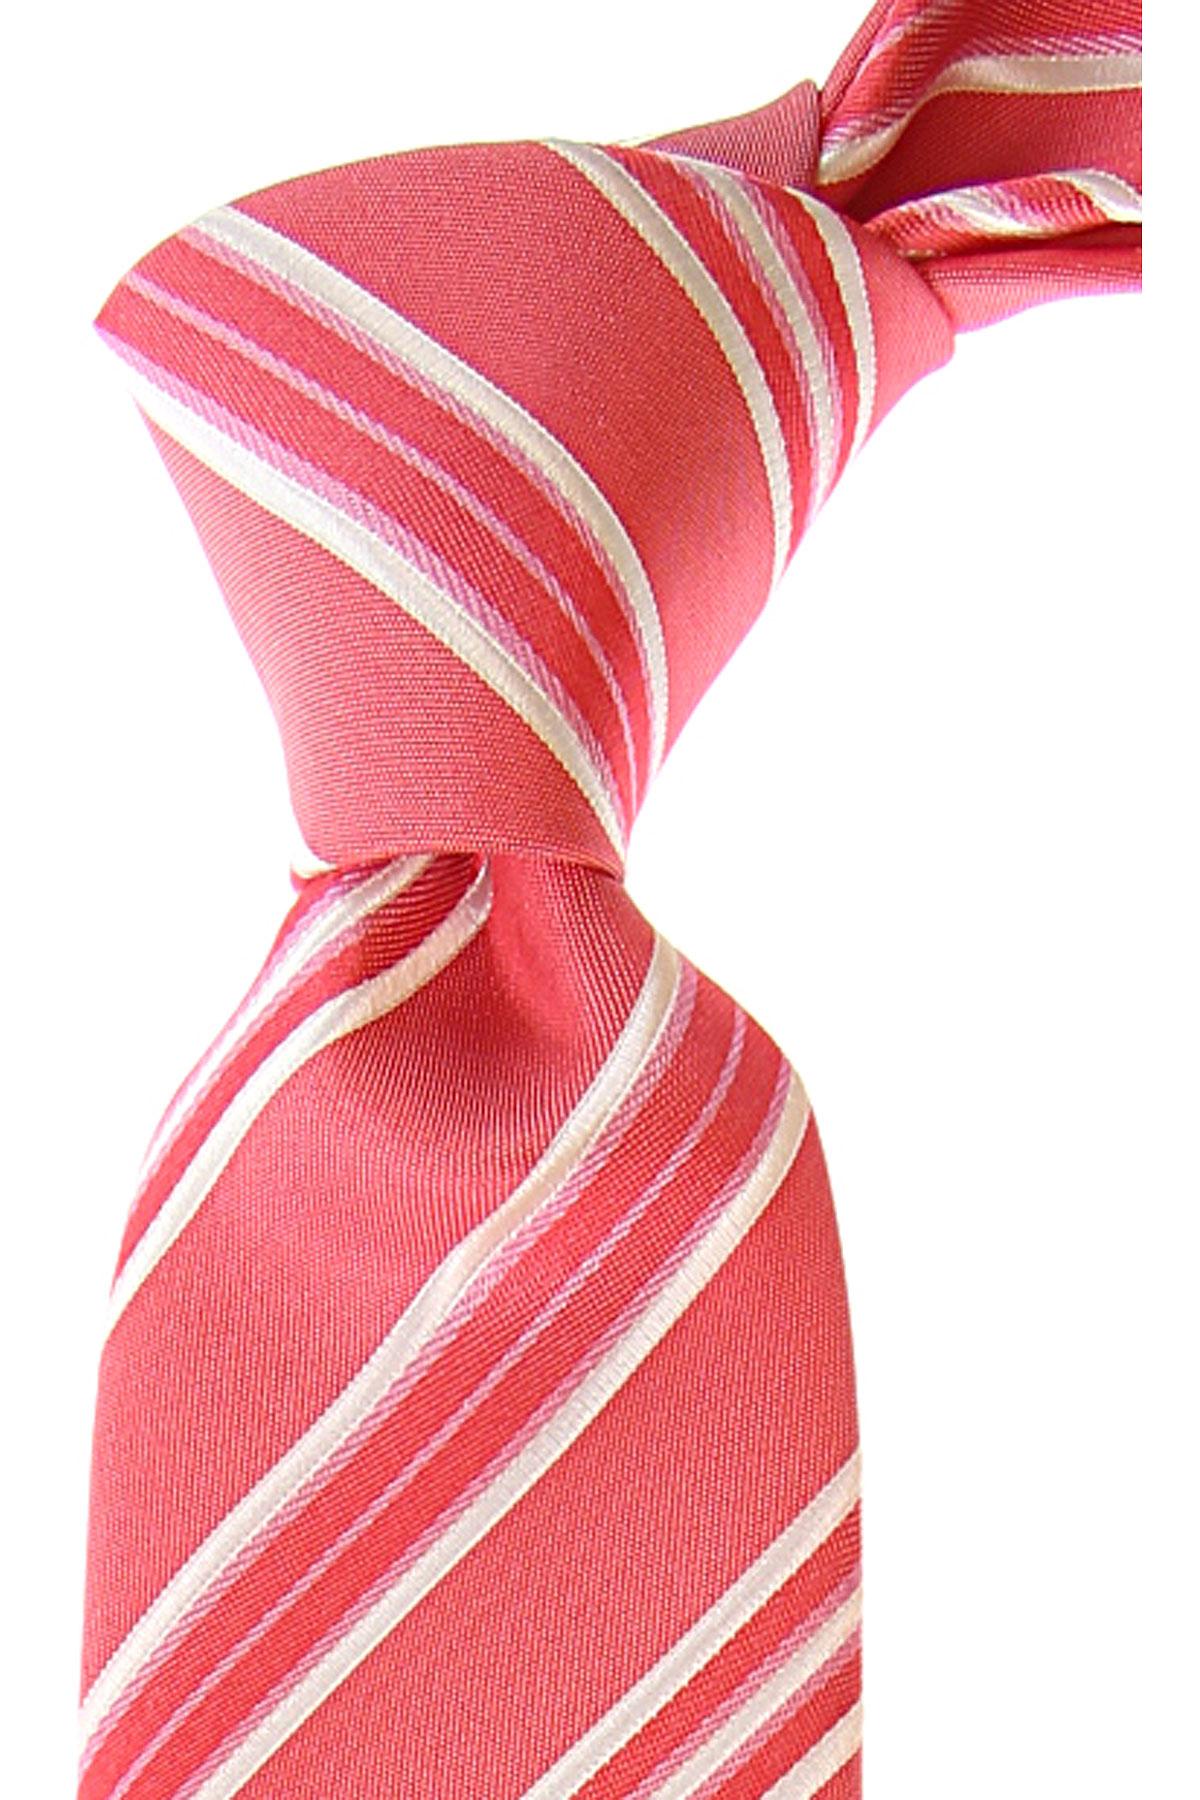 Fefe Napoli Ties On Sale, Coral Pink, Silk, 2019